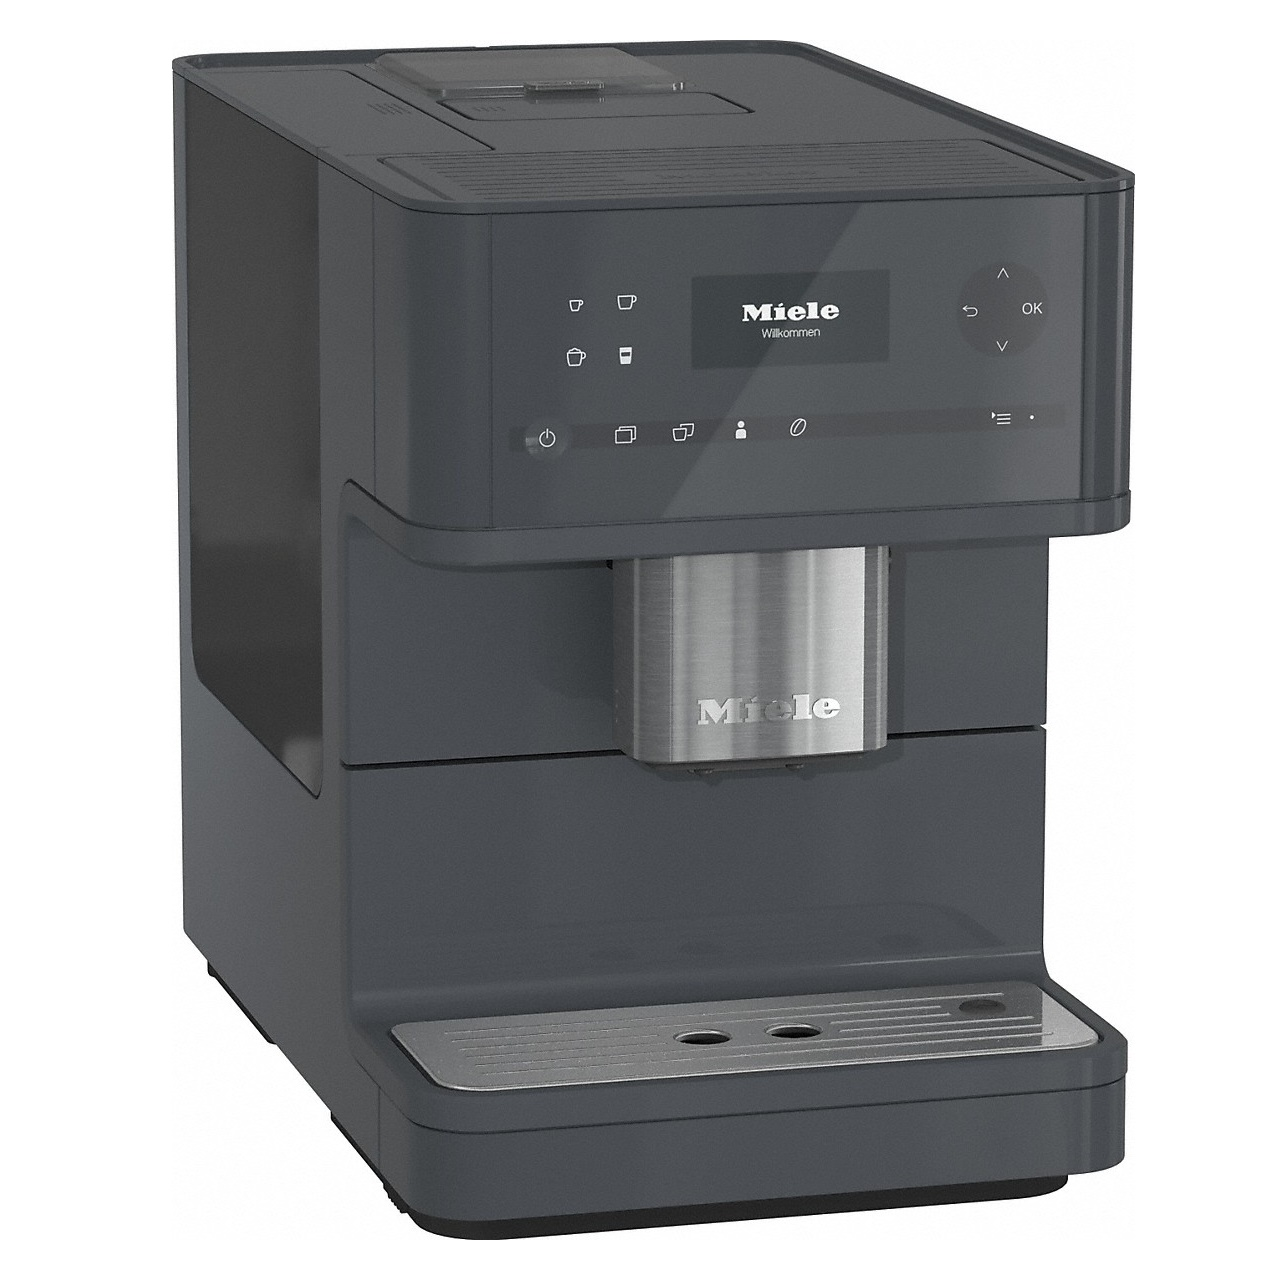 Miele stoni kafe aparat CM 6150